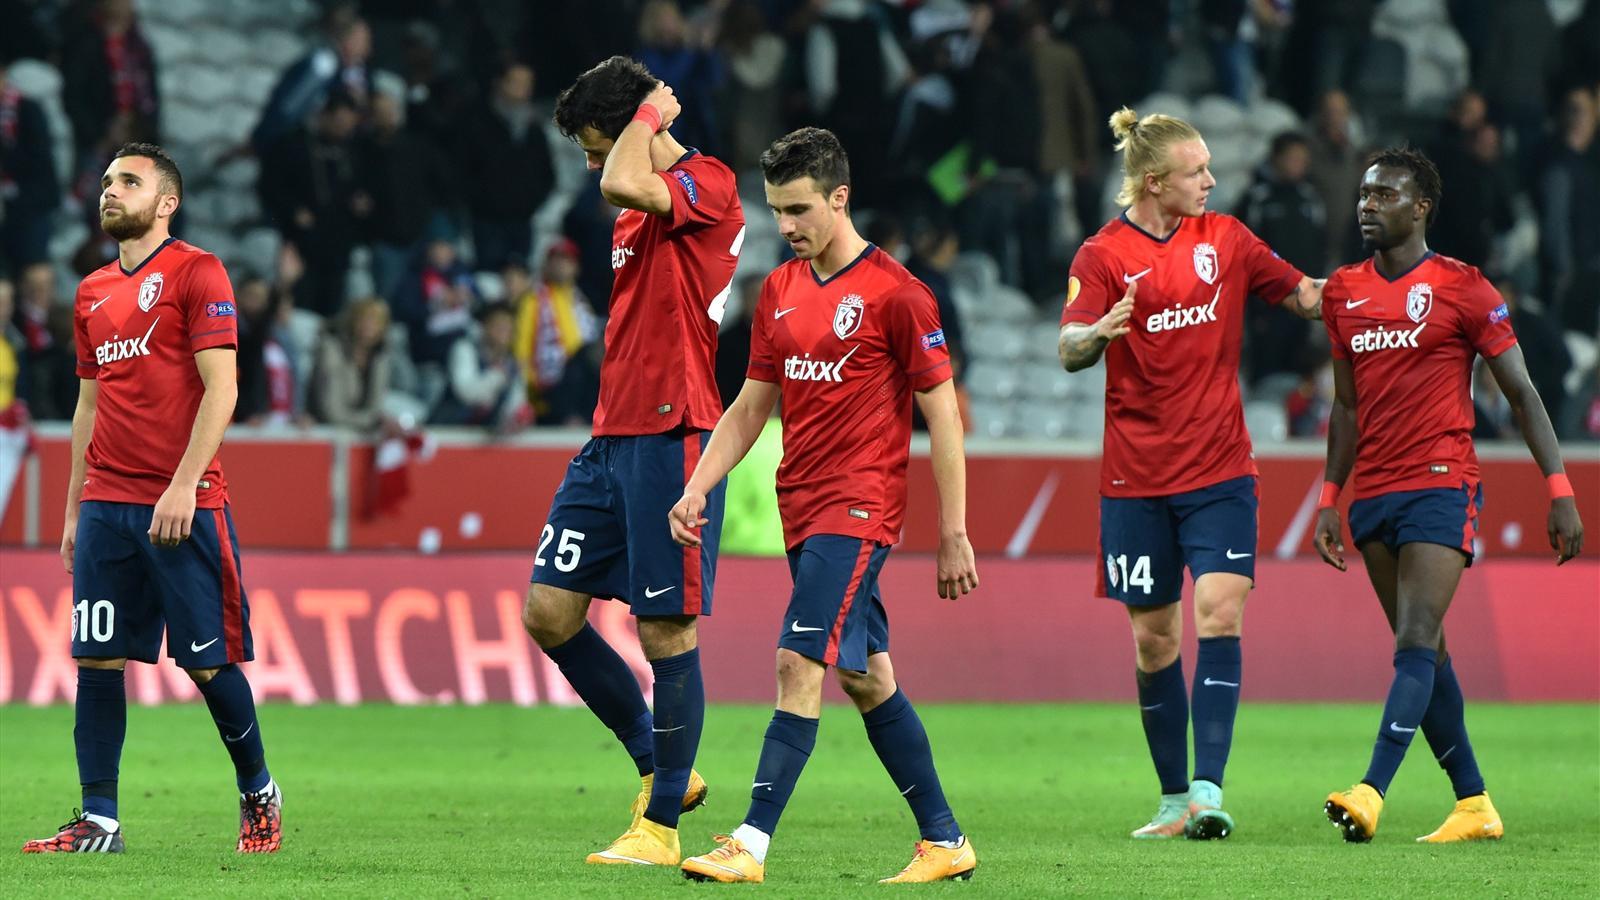 Match Stade de Reims vs Lille en direct live streaming